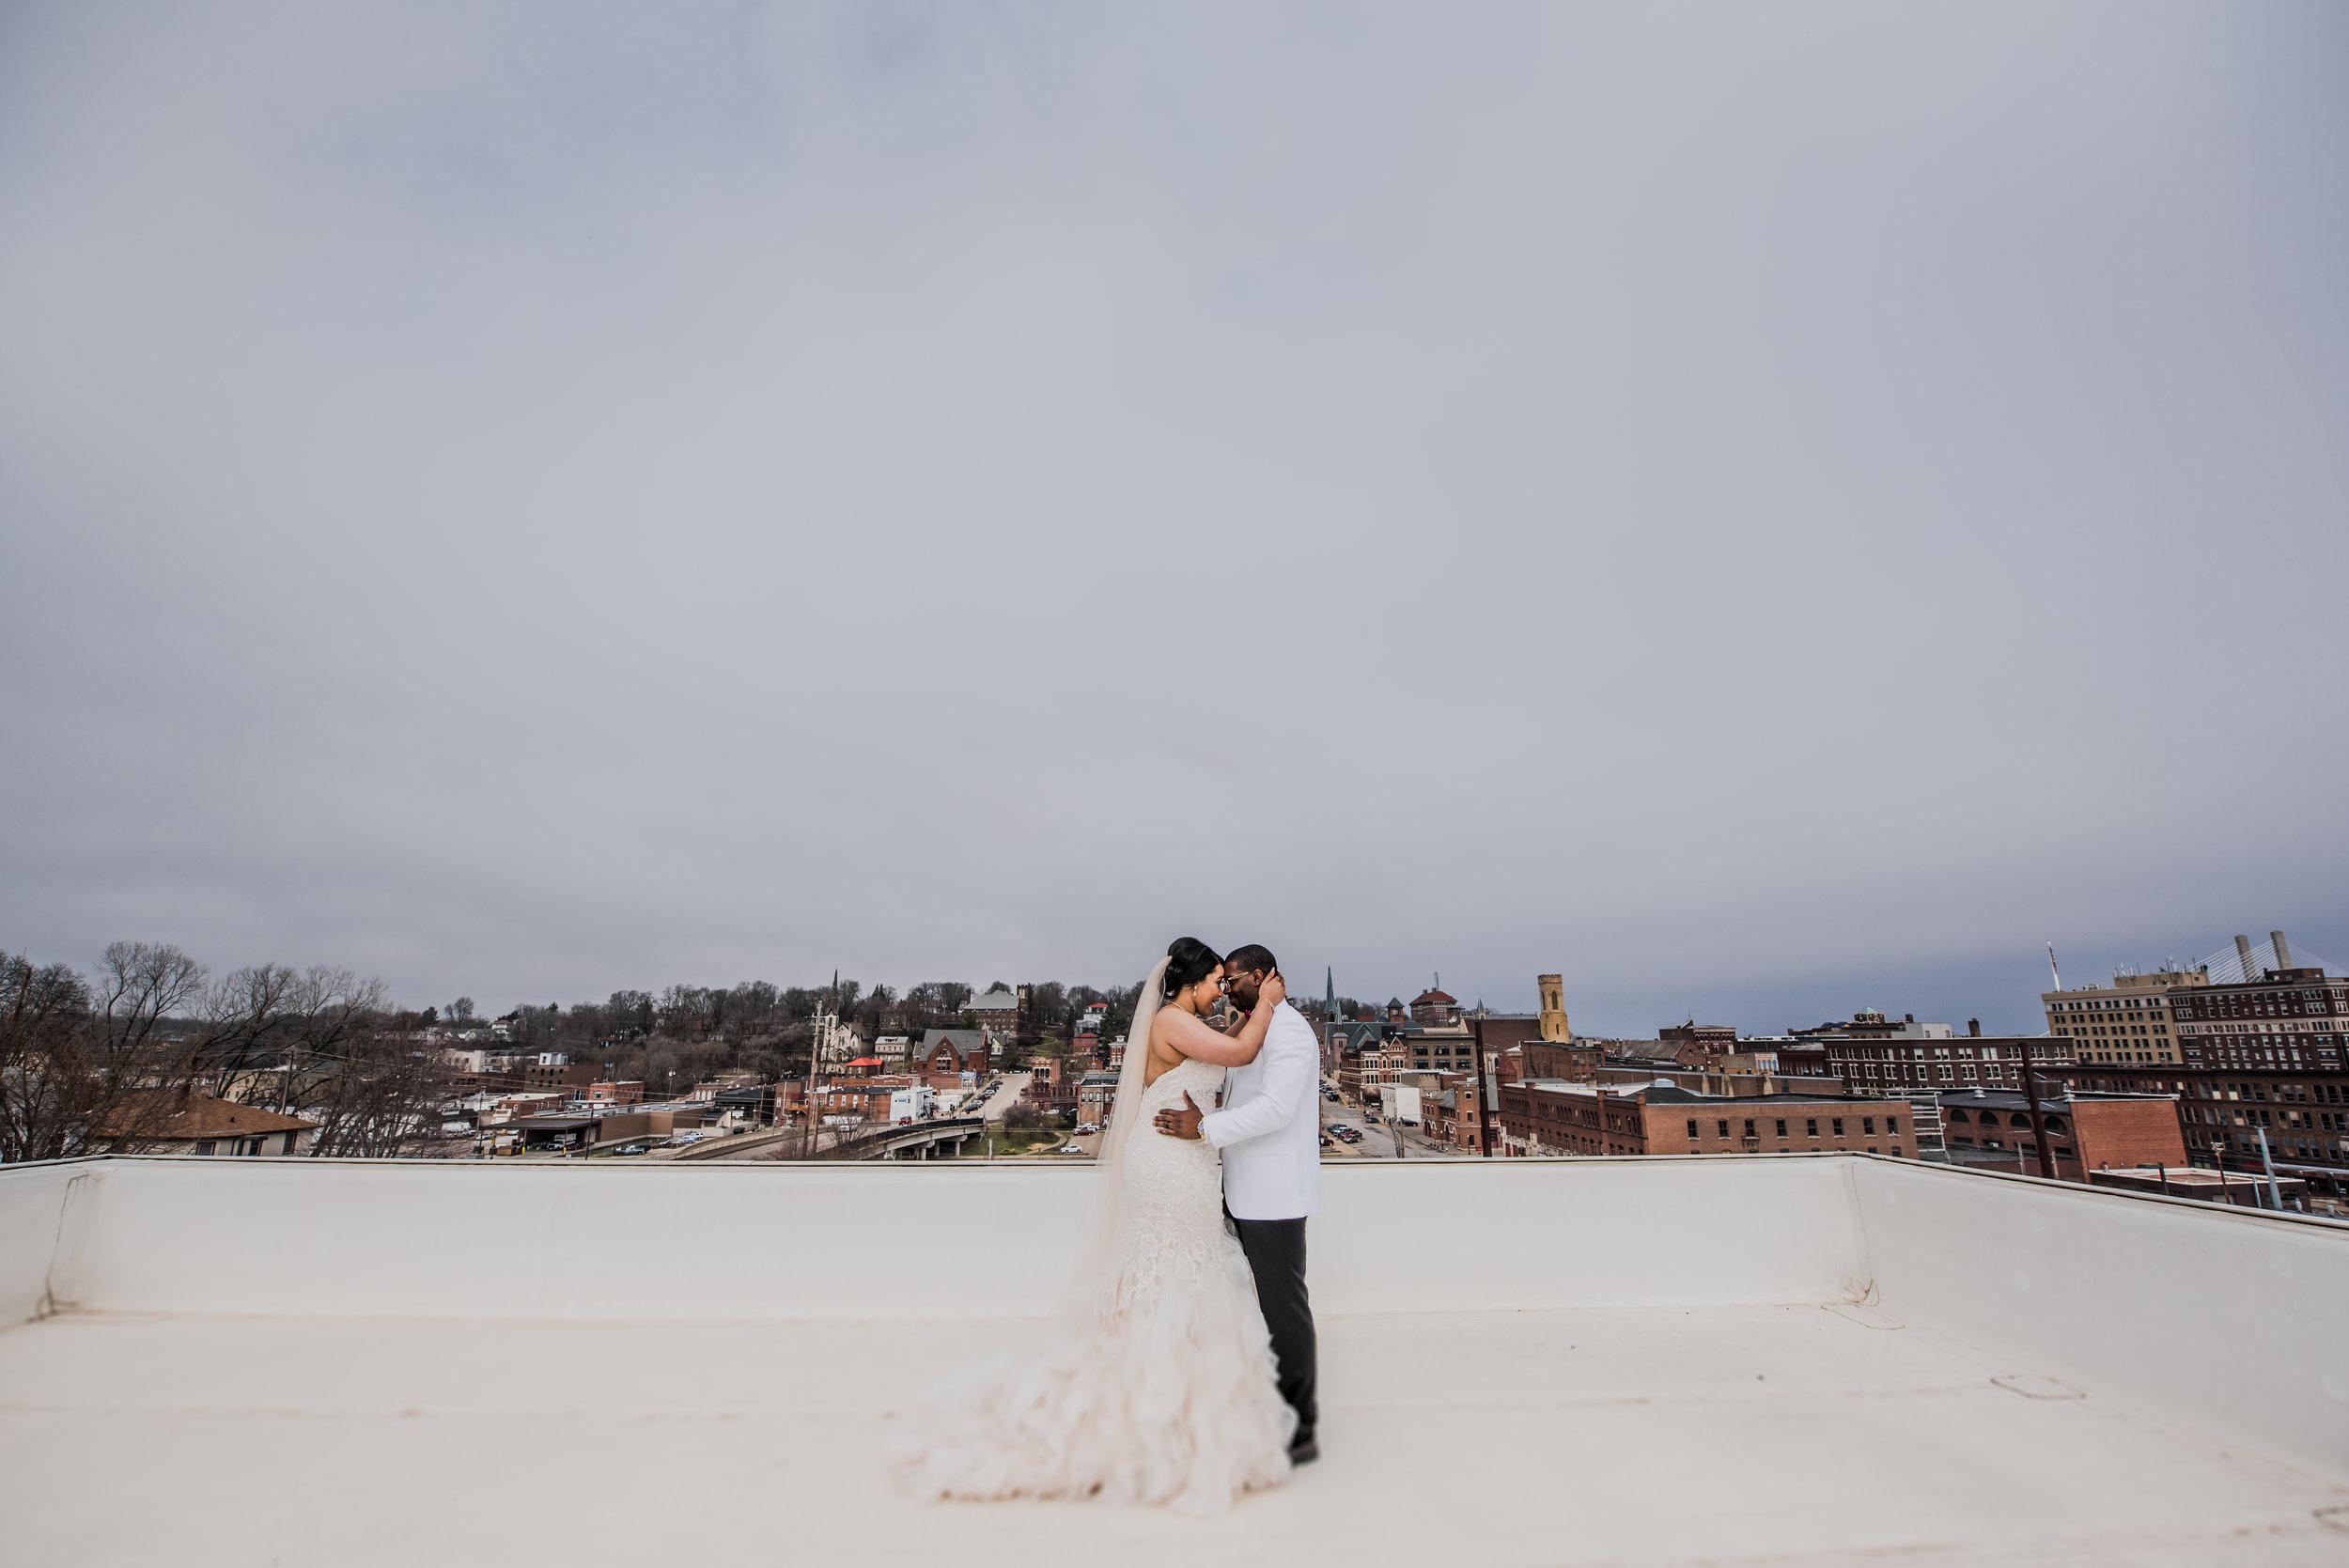 Burlington Iowa Wedding Midwest Photographer Melissa Cervantes _ Chantelle and Isaiah 243g.jpg